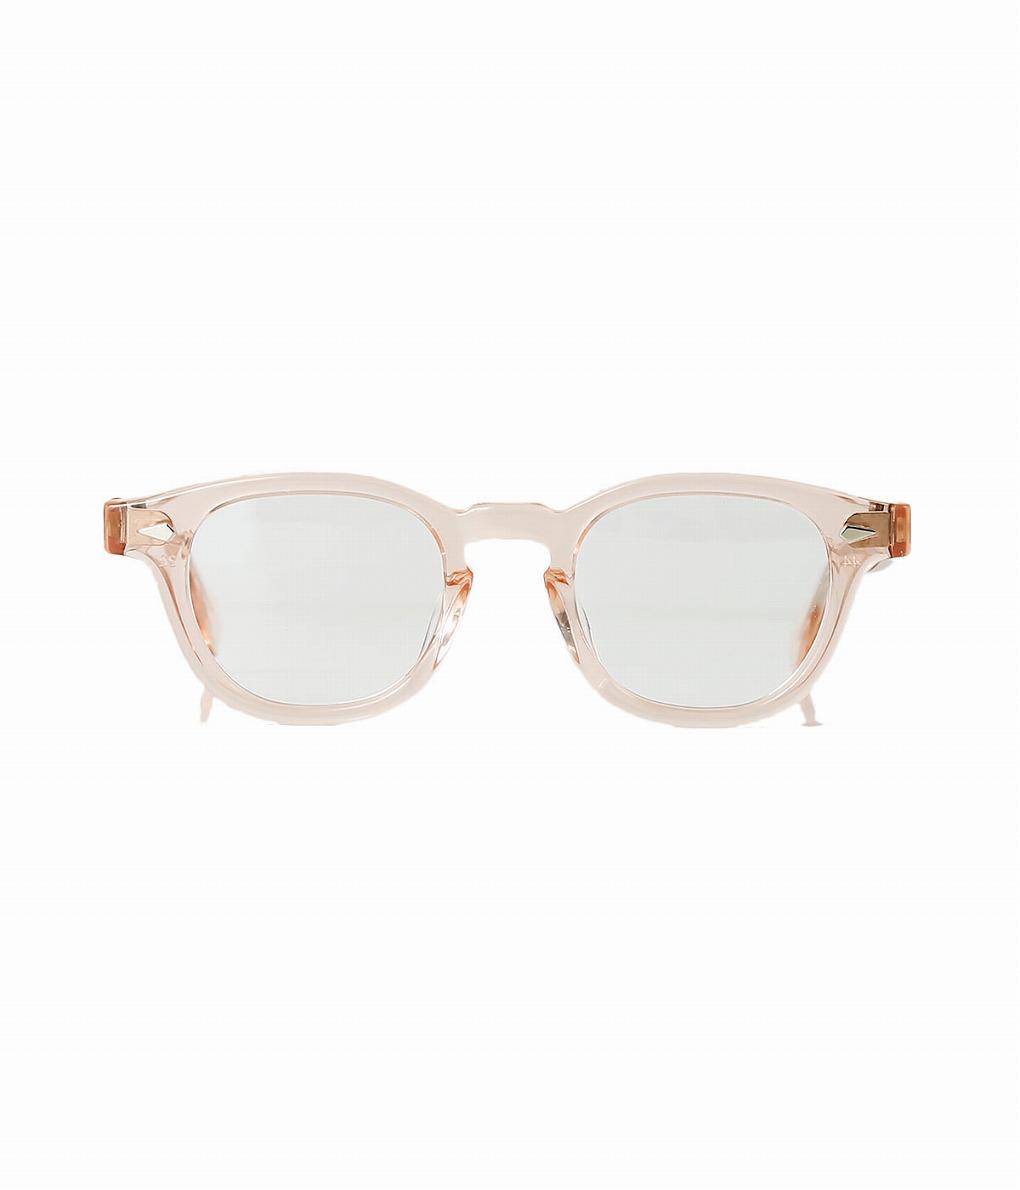 JULIUS TART OPTICAL / ジュリアスタートオプティカル : AR 46-22 - FRESH PINK / CLEAR - : メガネ 眼鏡 アイウェア メンズ レディース : JTPL-002H 【COR】